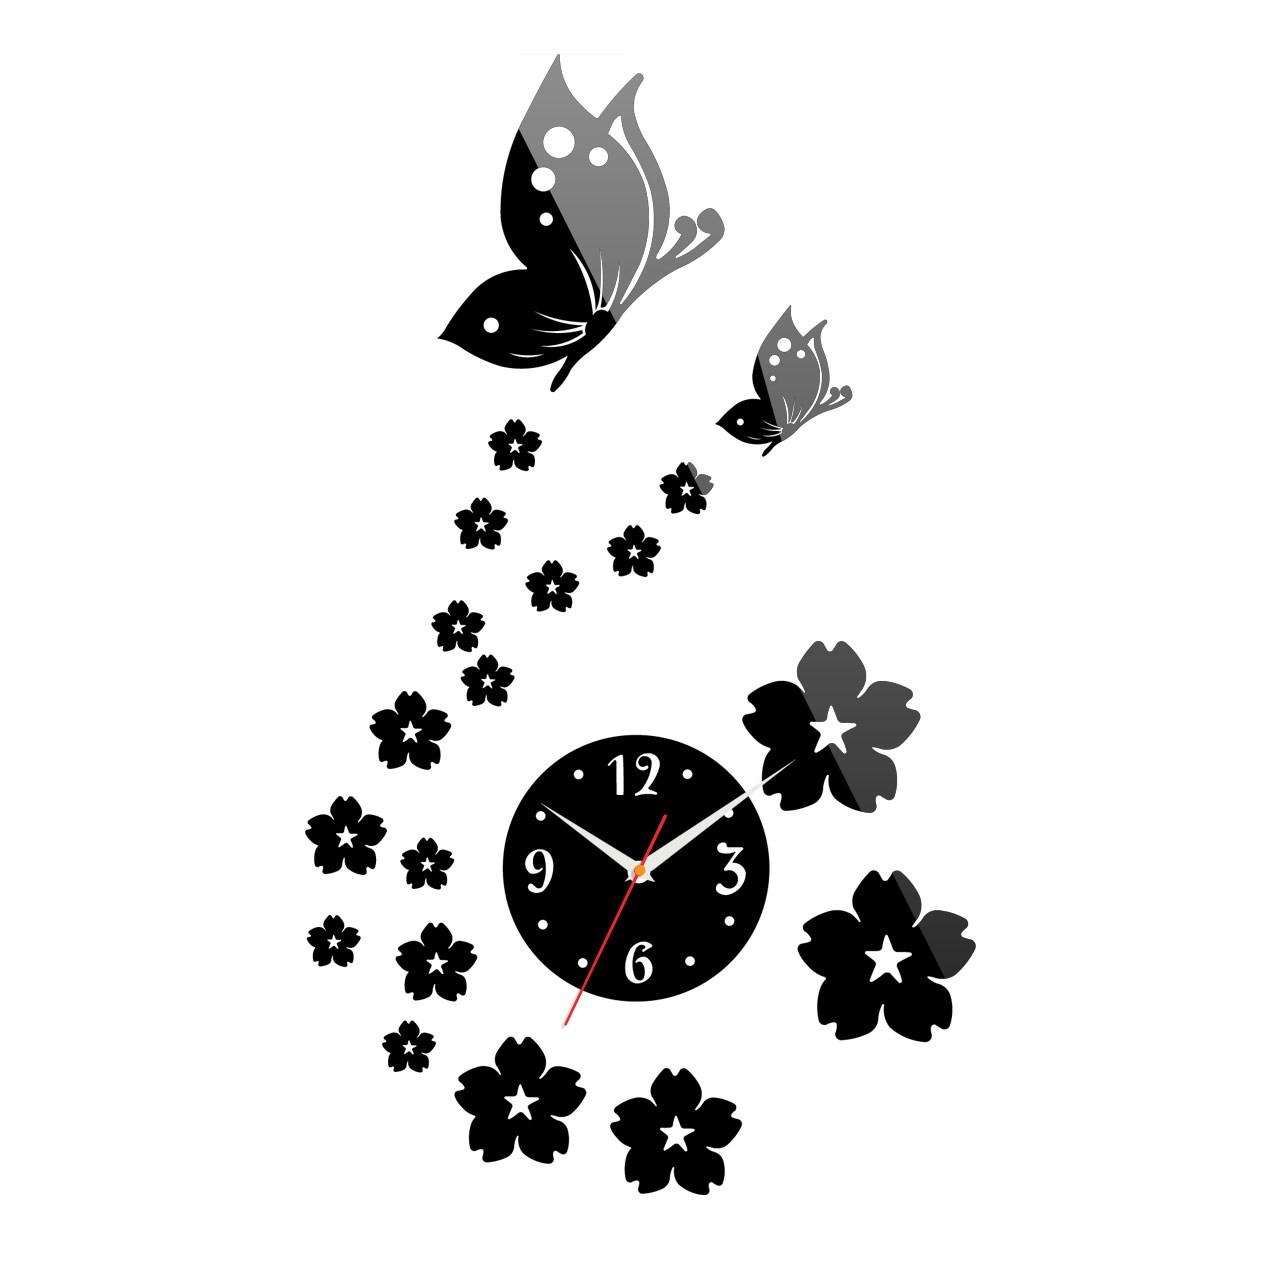 خرید ساعت دیواری پدیده شاپ طرح بهار